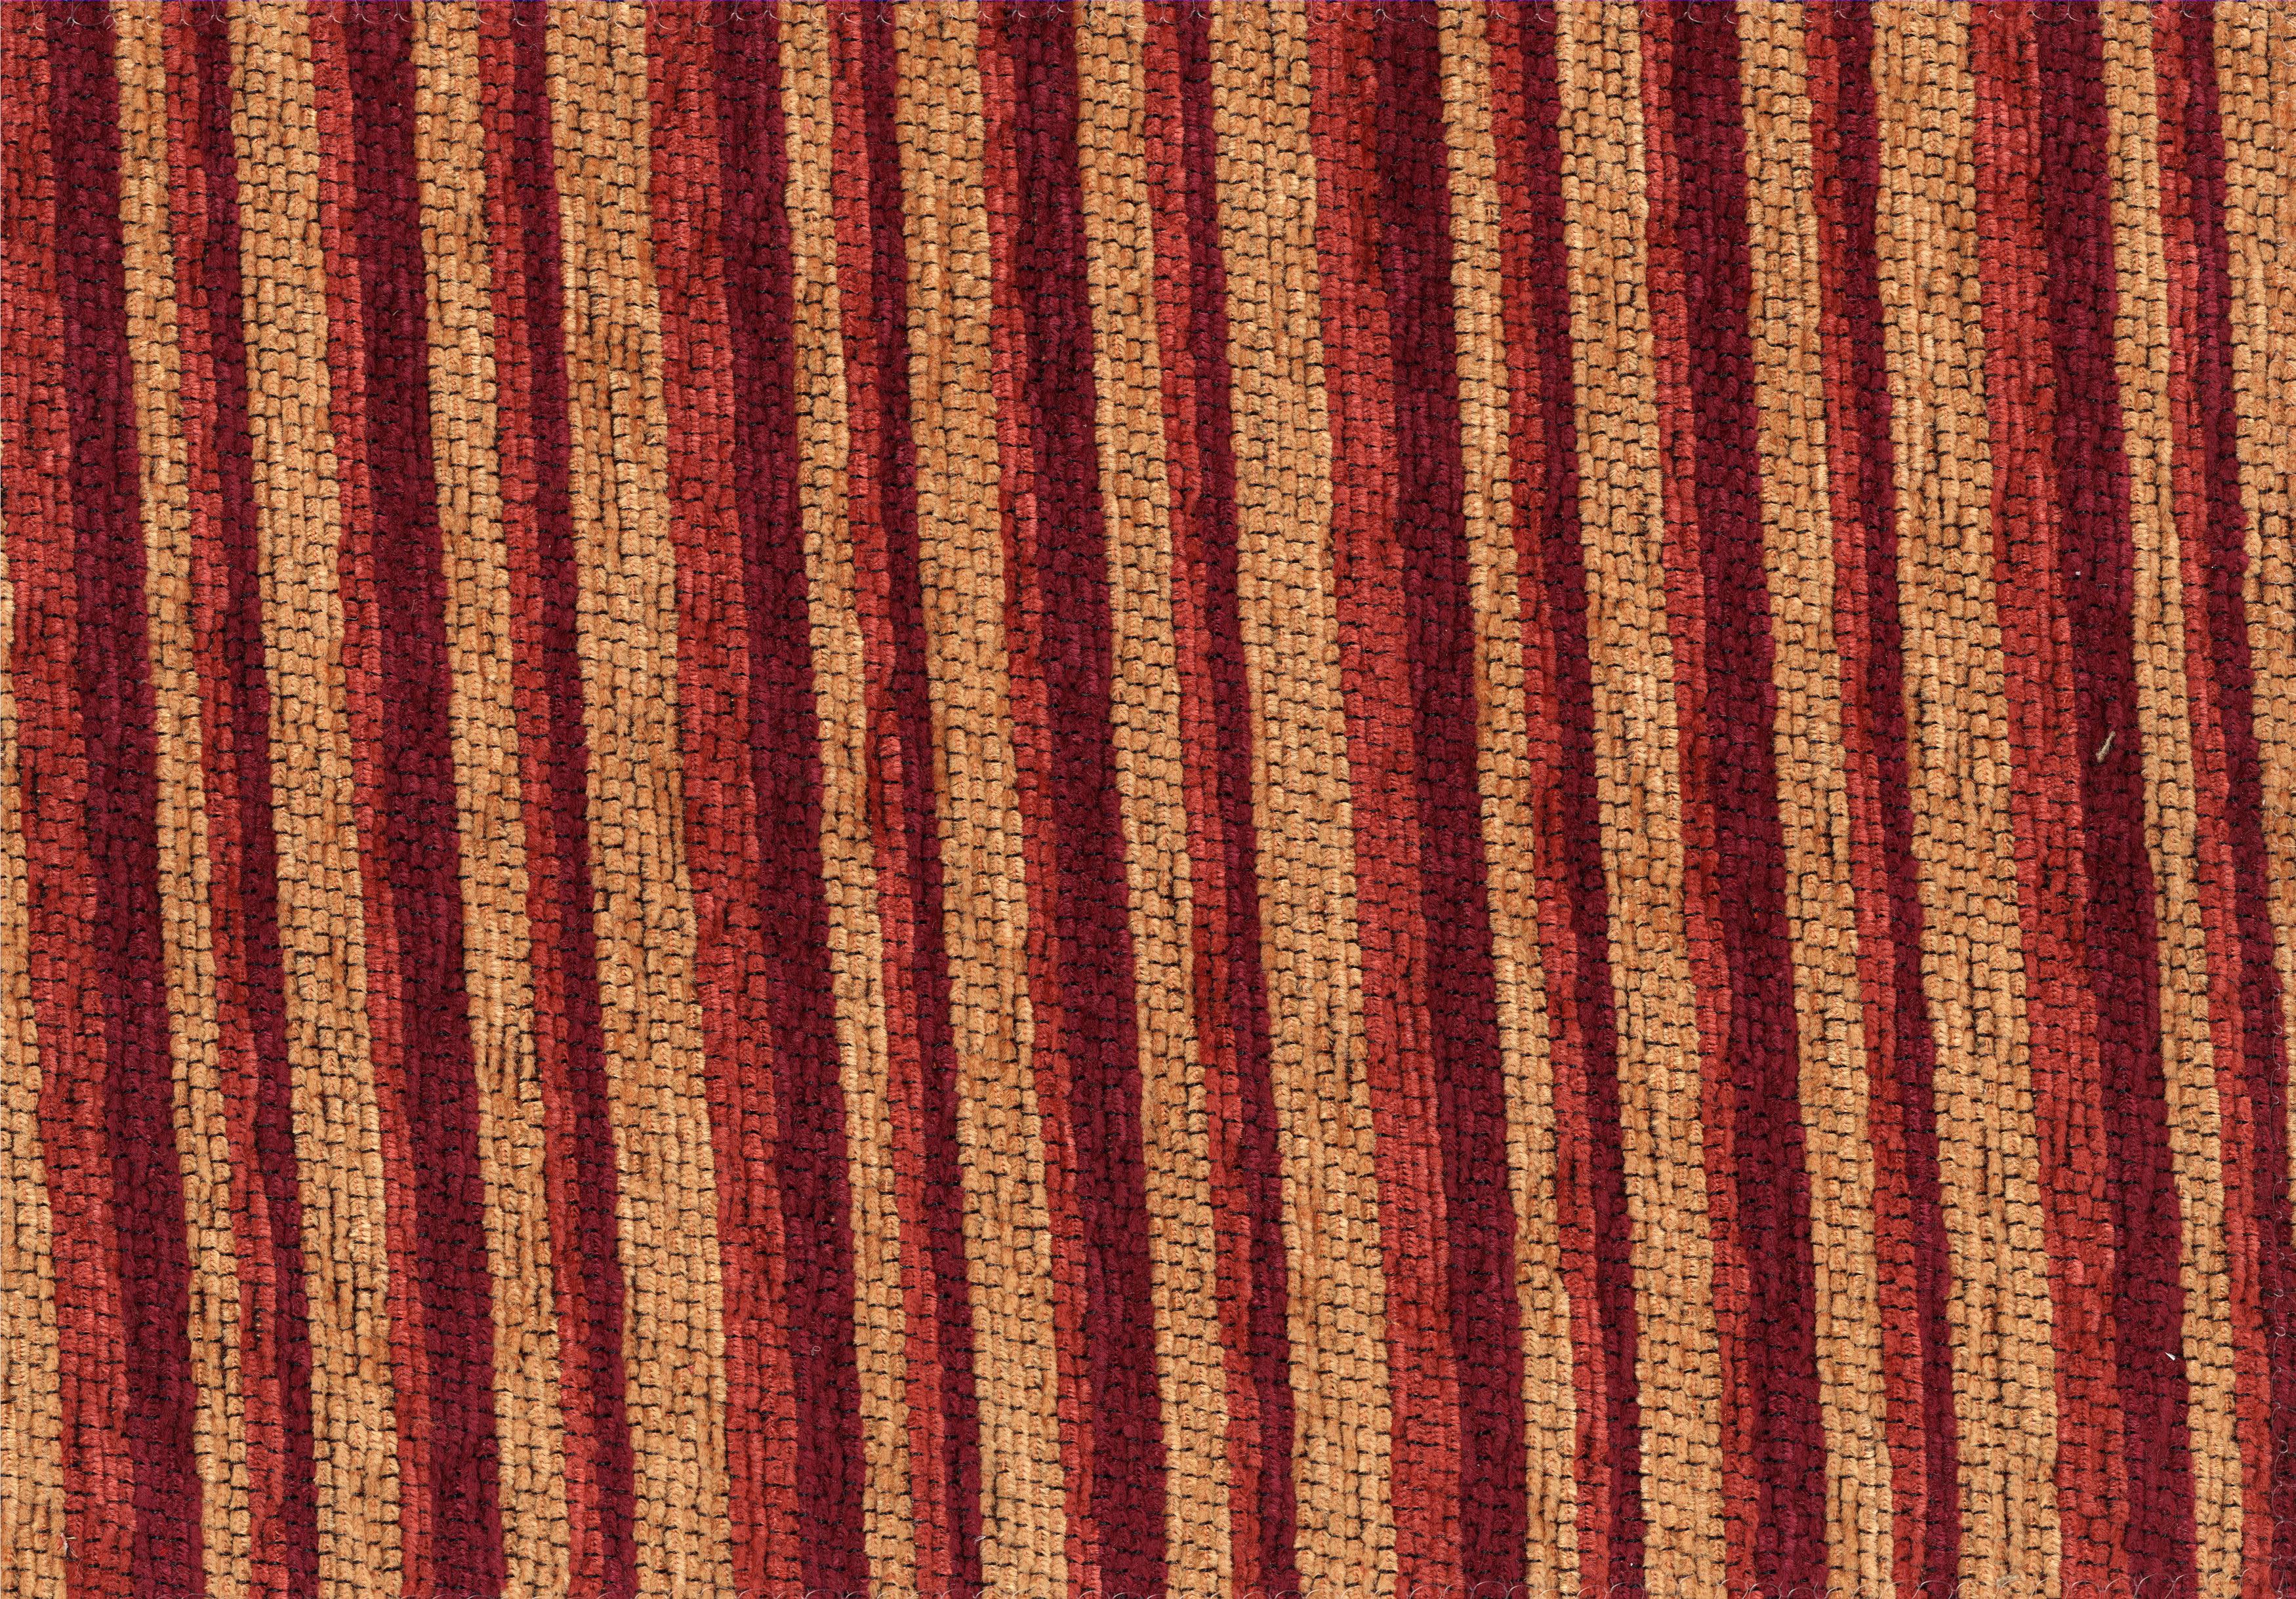 Rusty Iron Texture Fabric | Texture Fabri...